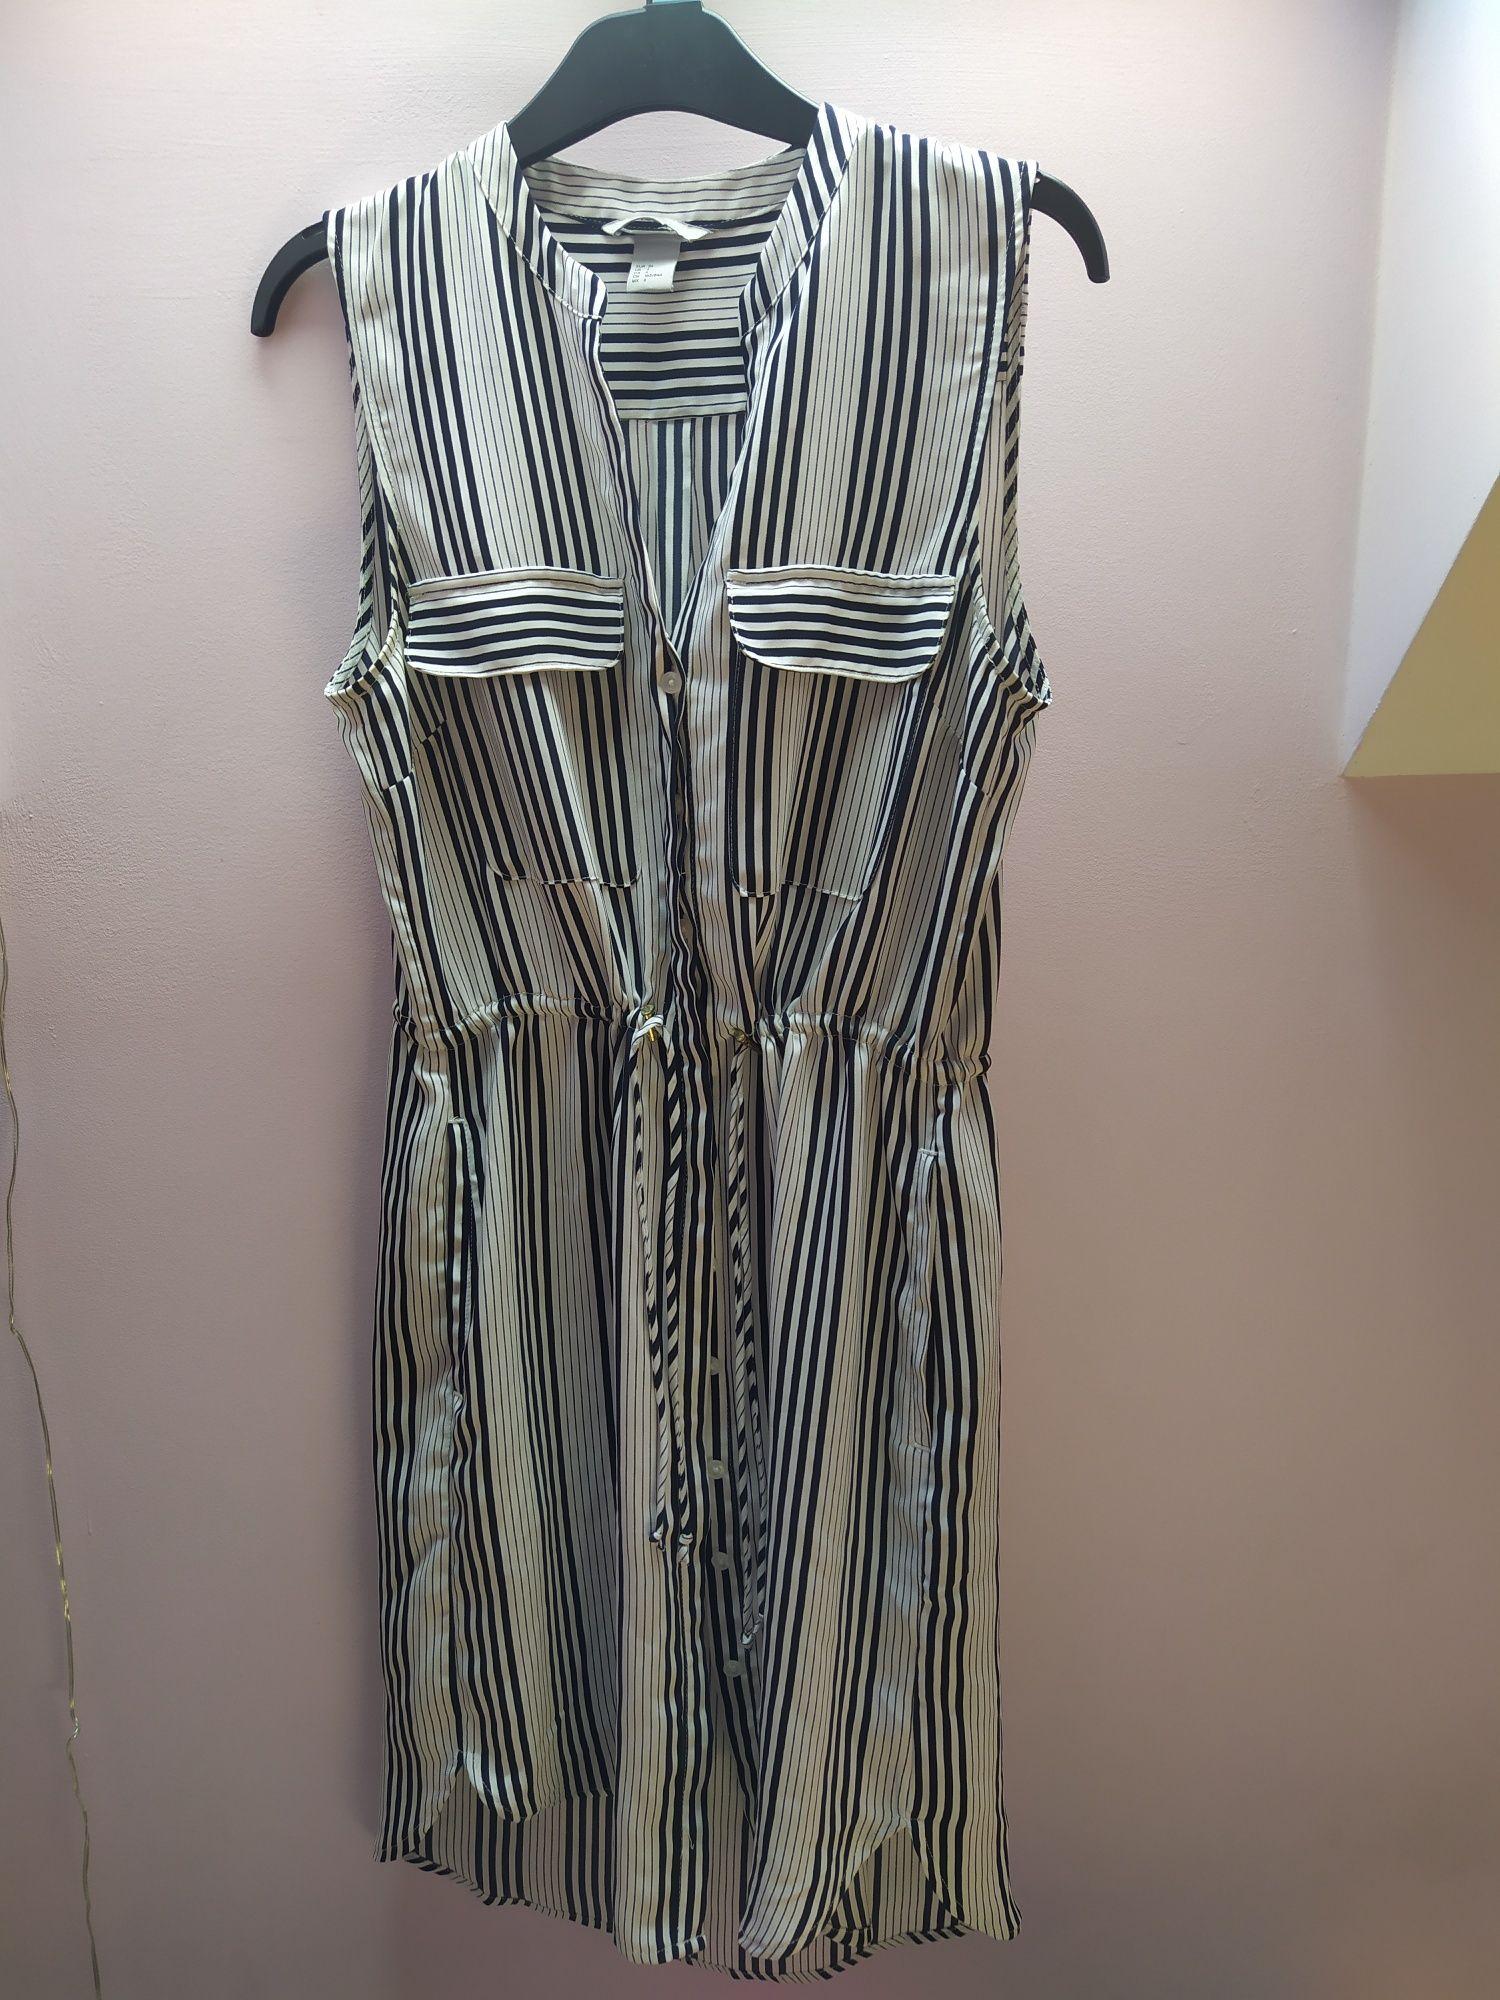 Sukienka H&M, sukienka letnia